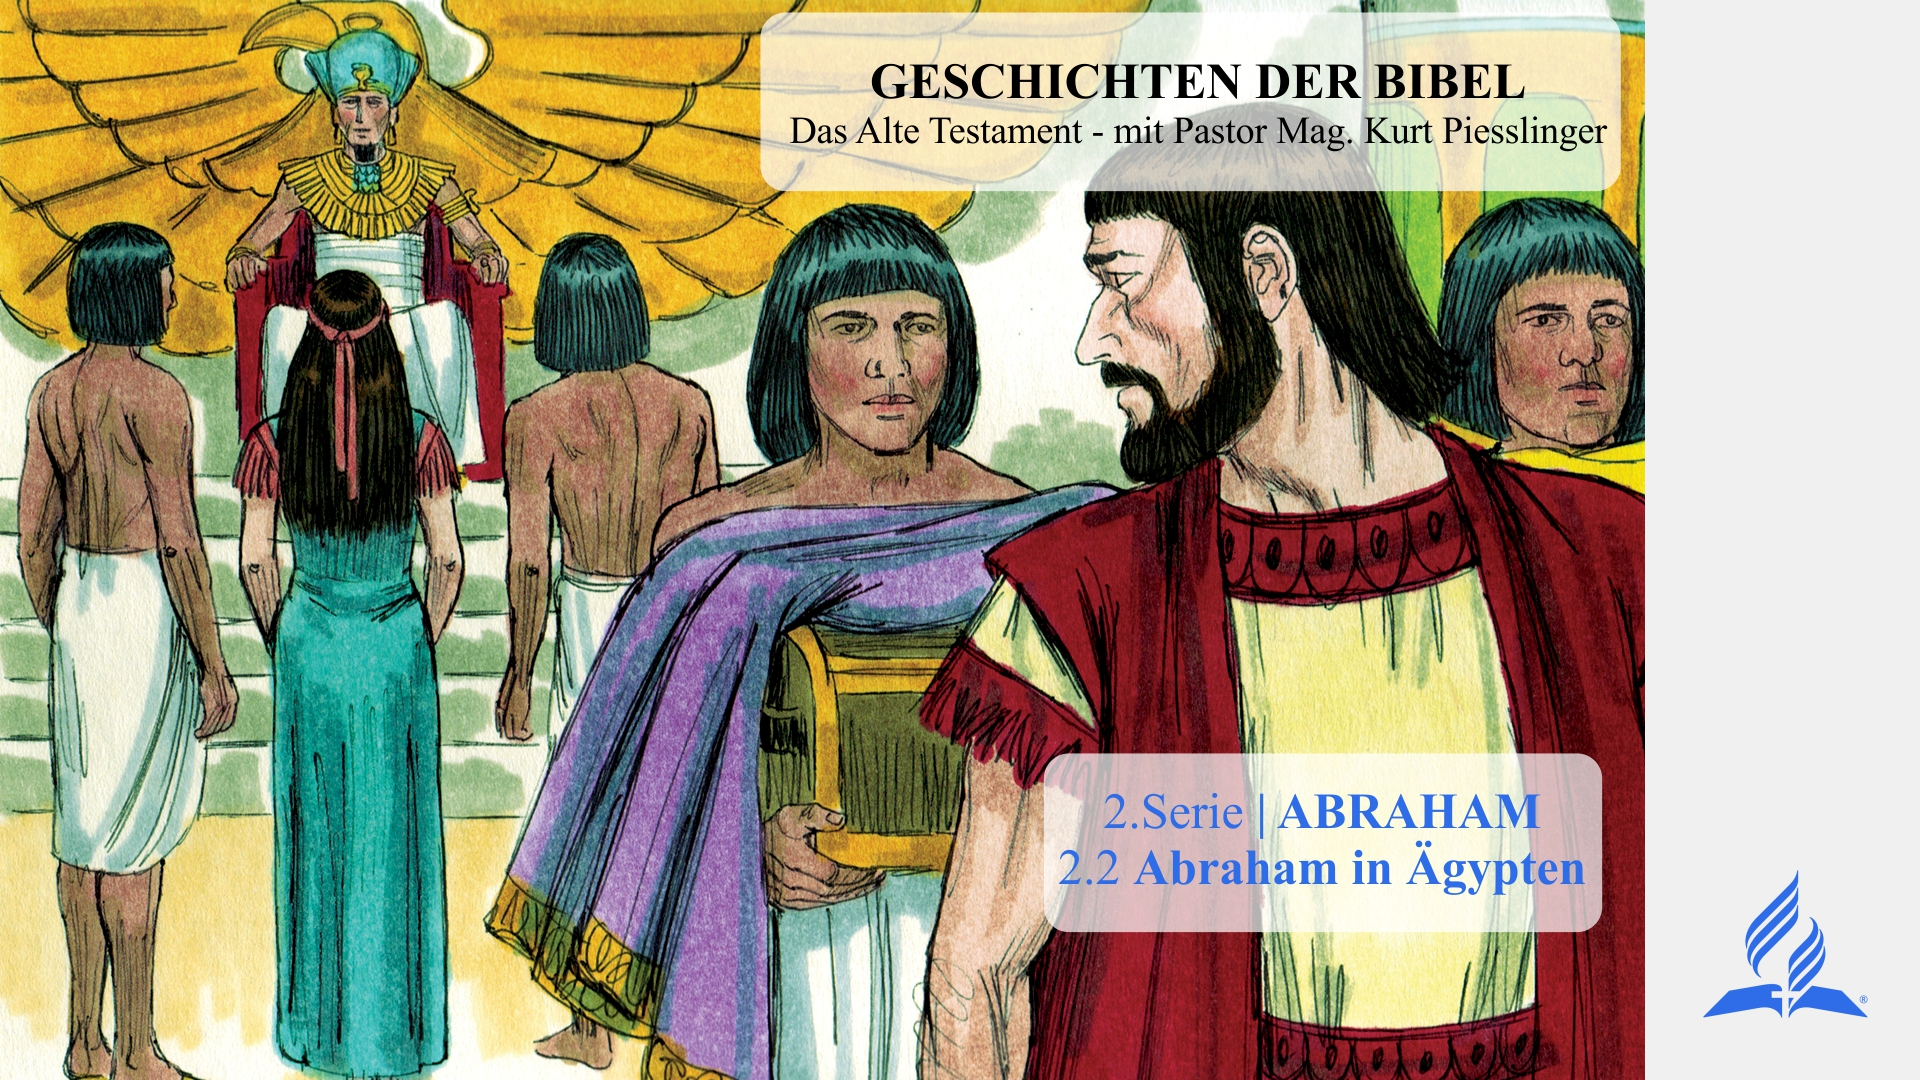 2.2 Abraham in Ägypten – ABRAHAM | Pastor Mag. Kurt Piesslinger